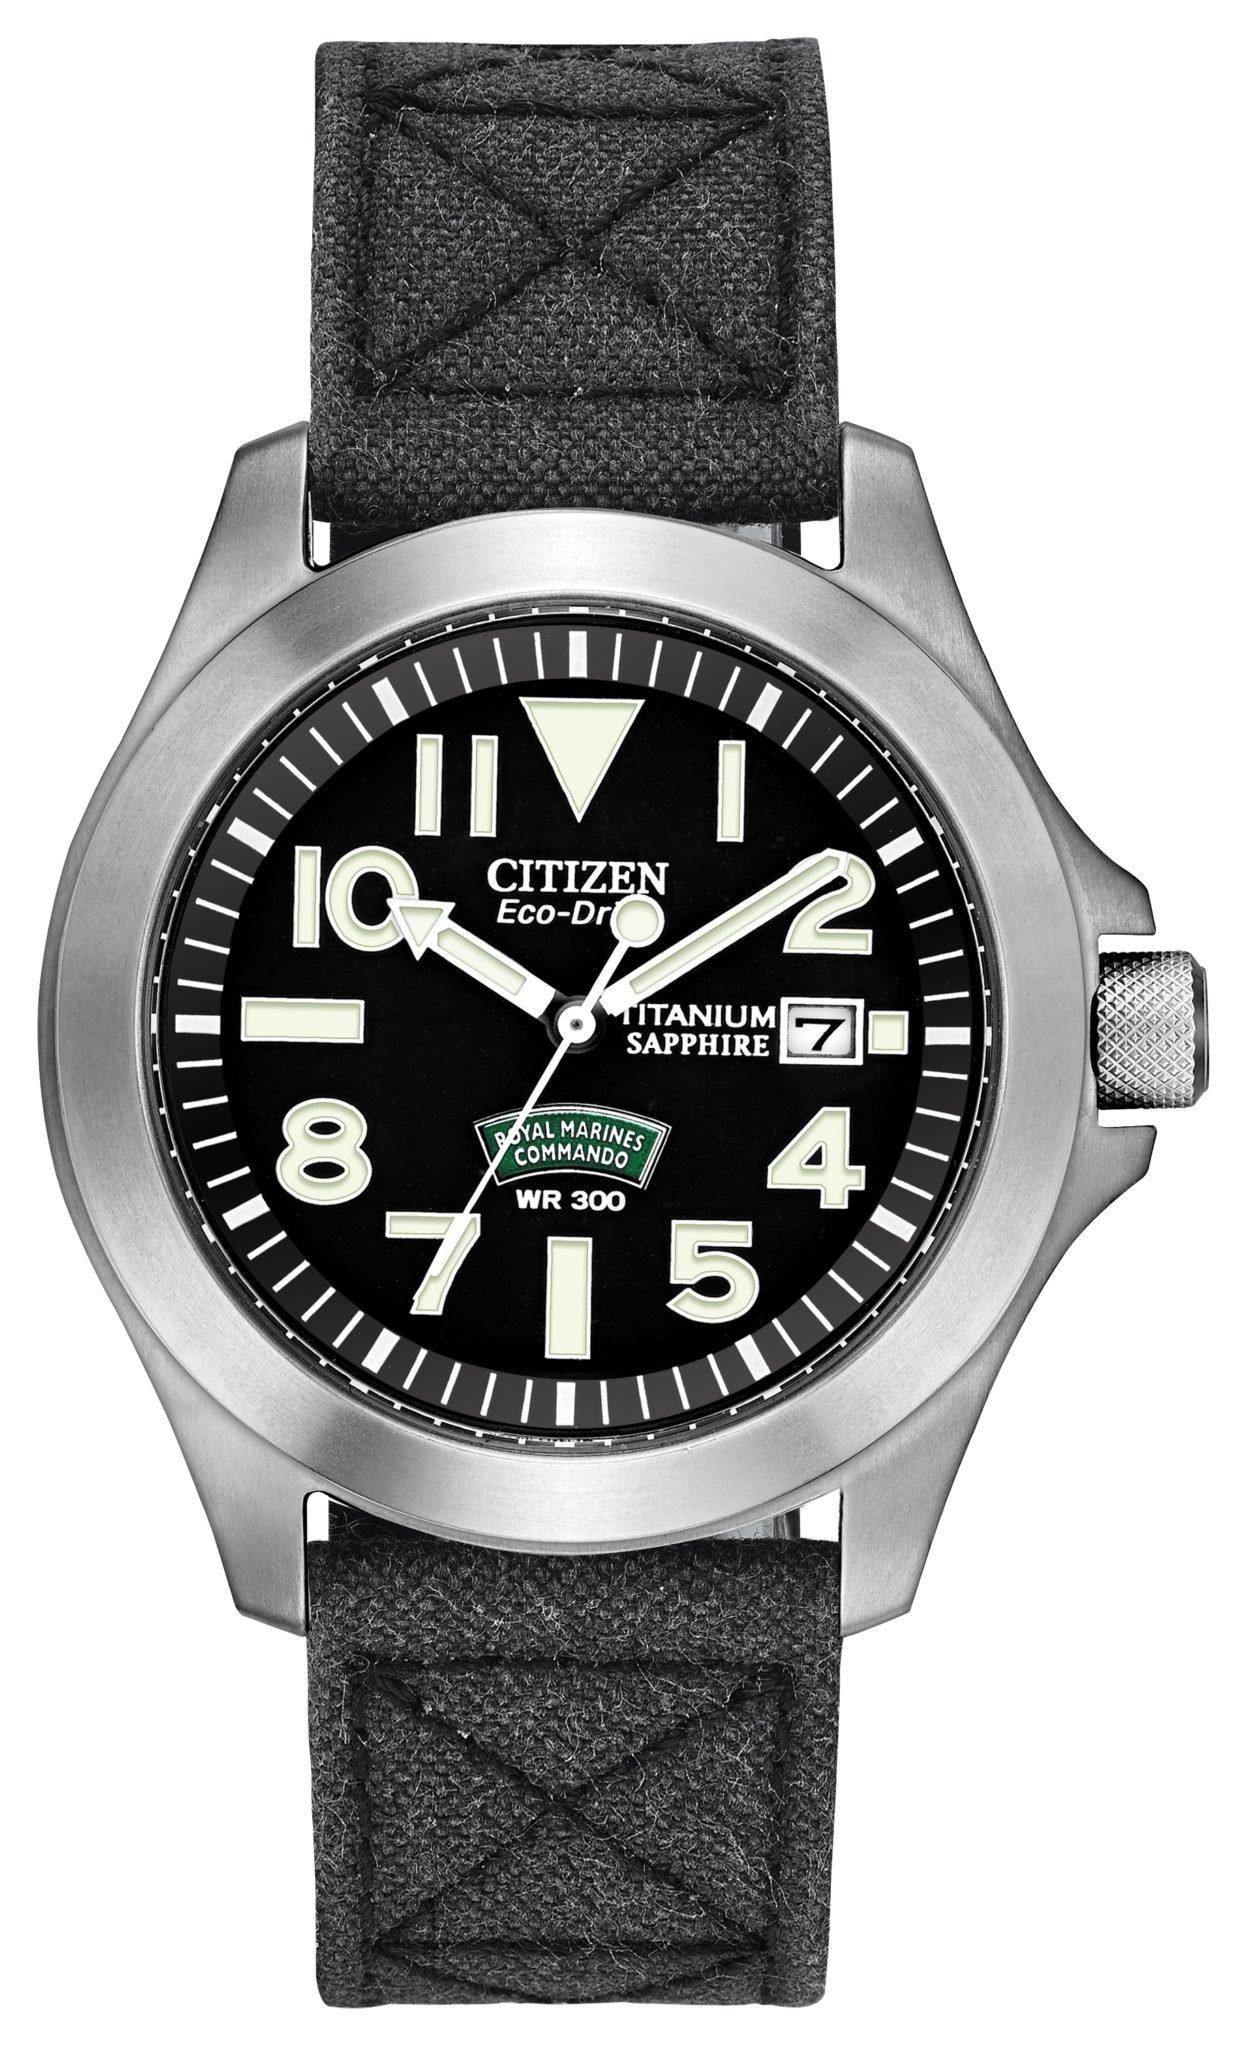 2fe38055fd2a Citizen Royal Marines Commando BN0110-06E - First Class Watches™